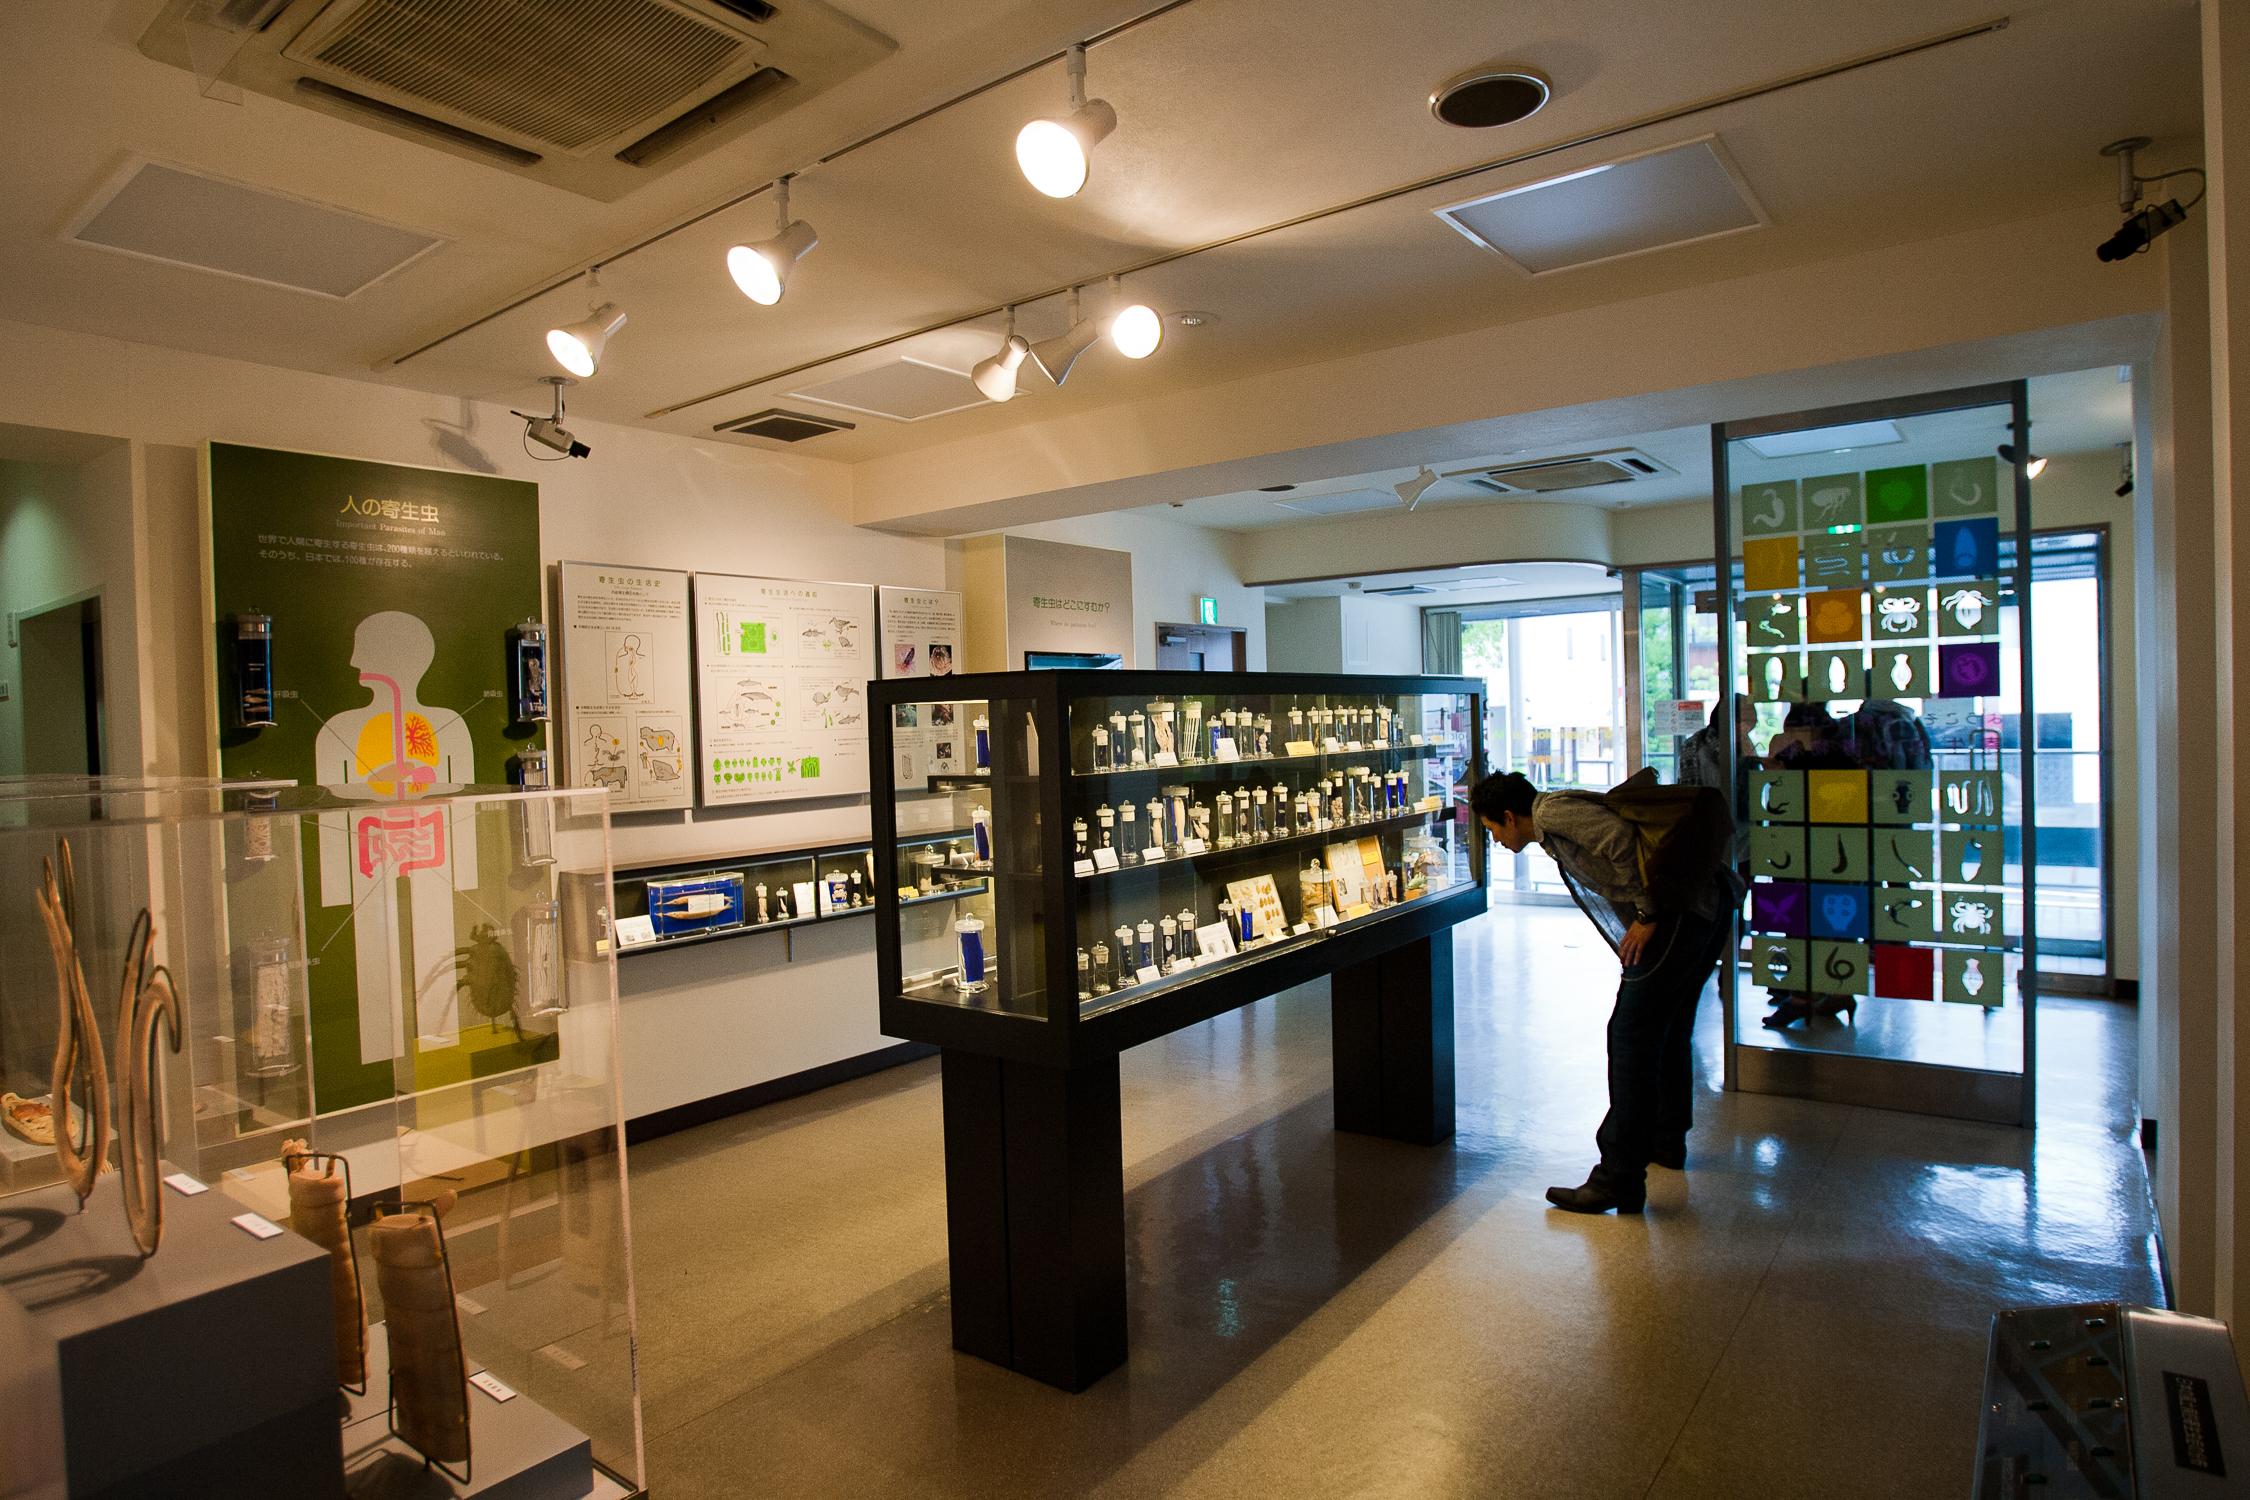 20110423_Meguro_Parasite_Museum_MG_3205.jpg